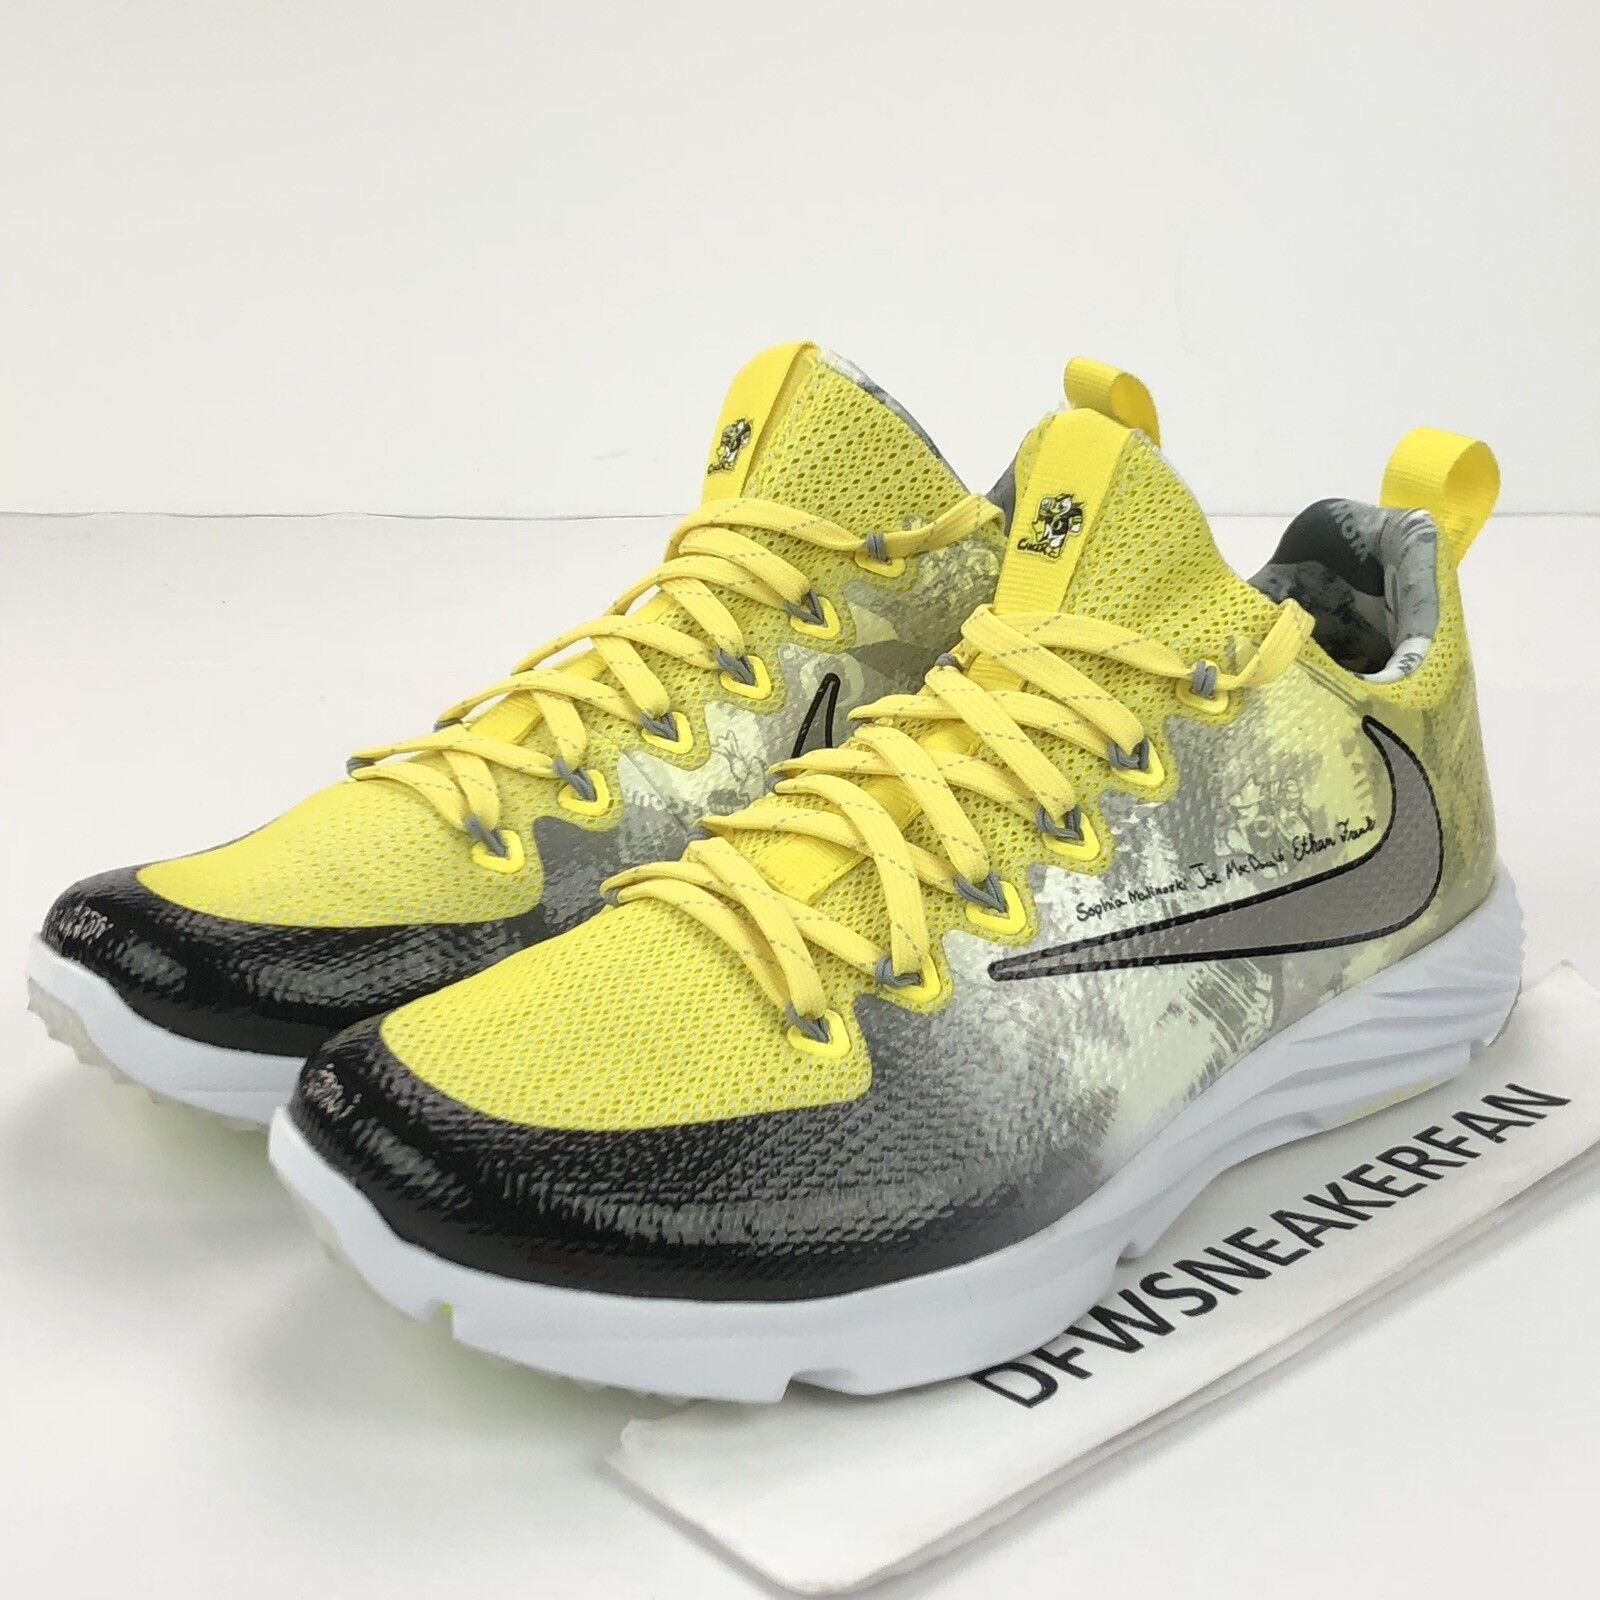 Nike Doernbecher Vapor Speed Turf Schuhe Herren Sz 11.5 Oregon Enten 923486-701